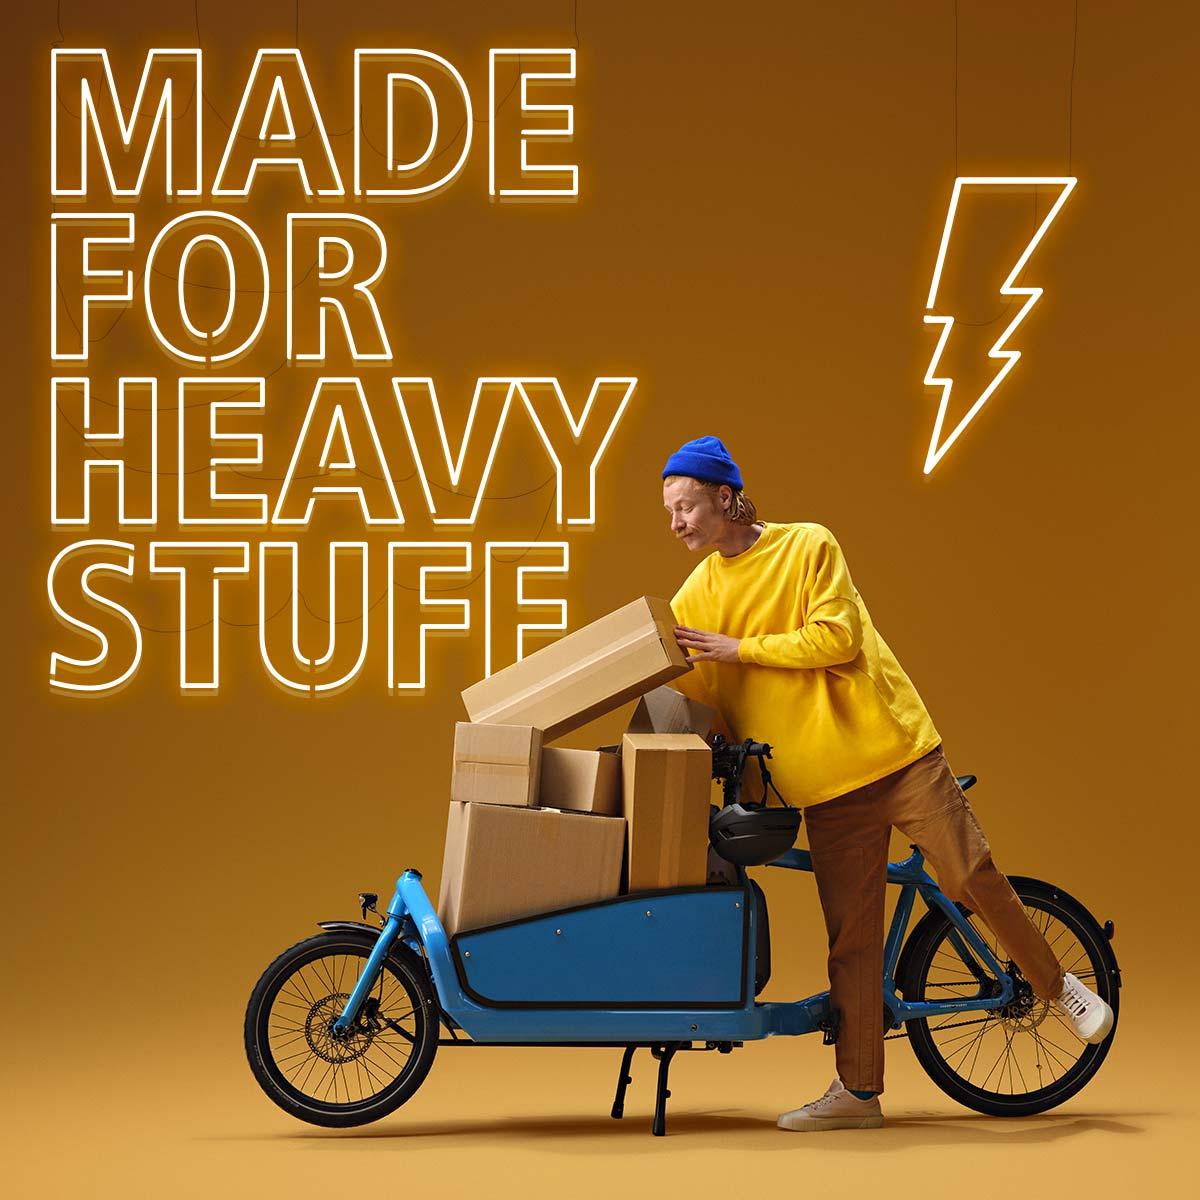 Shimano Cargo e-bikes, heavy-duty electric motor cargo-specific power tunes,made for heavy stuff